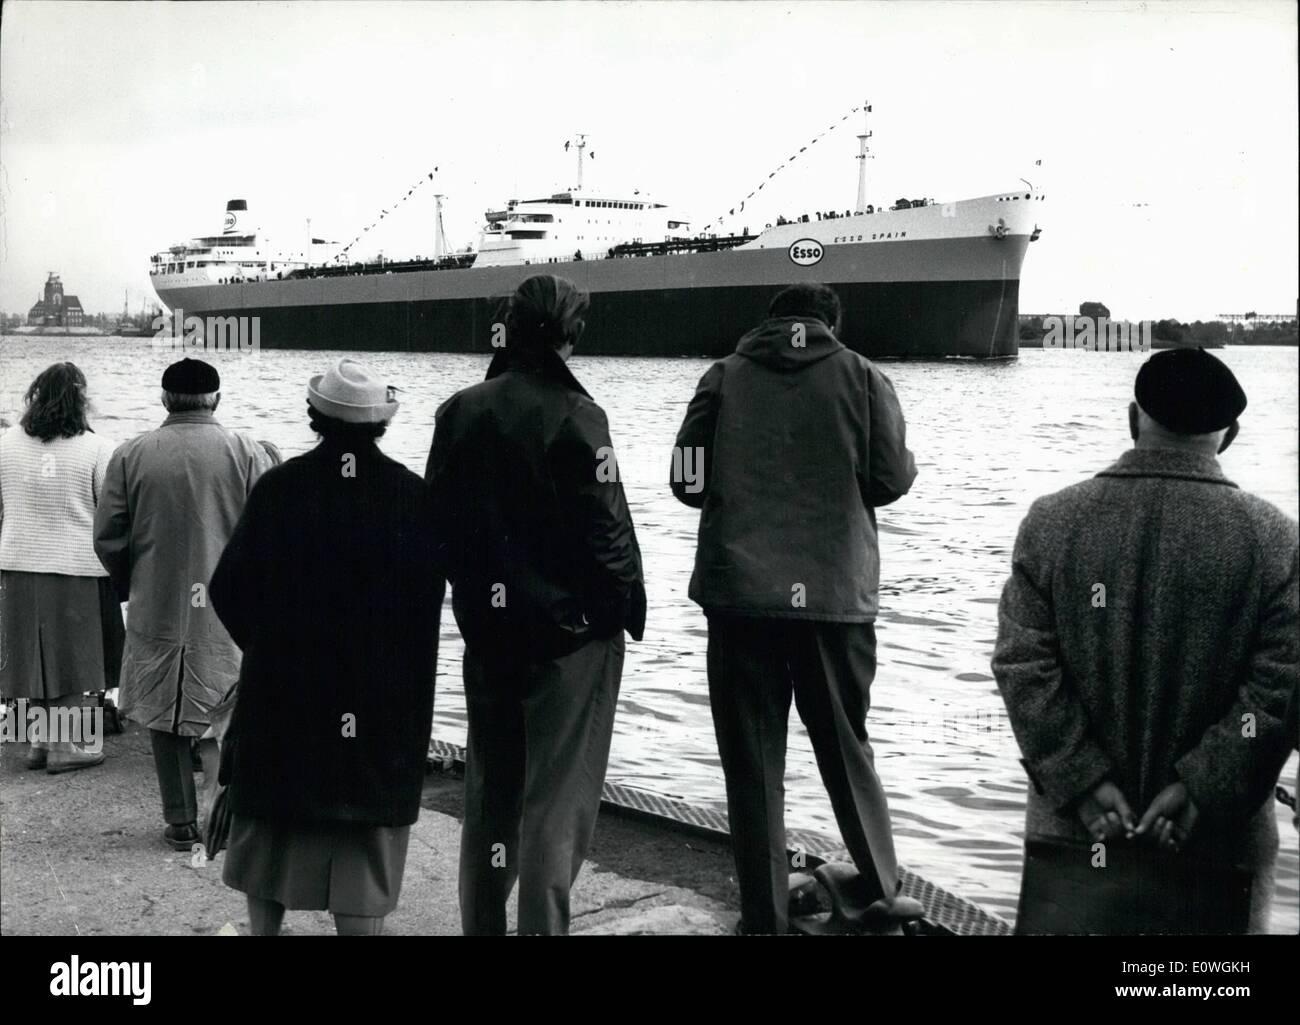 Archival German Ship Stock Photos & Archival German Ship Stock